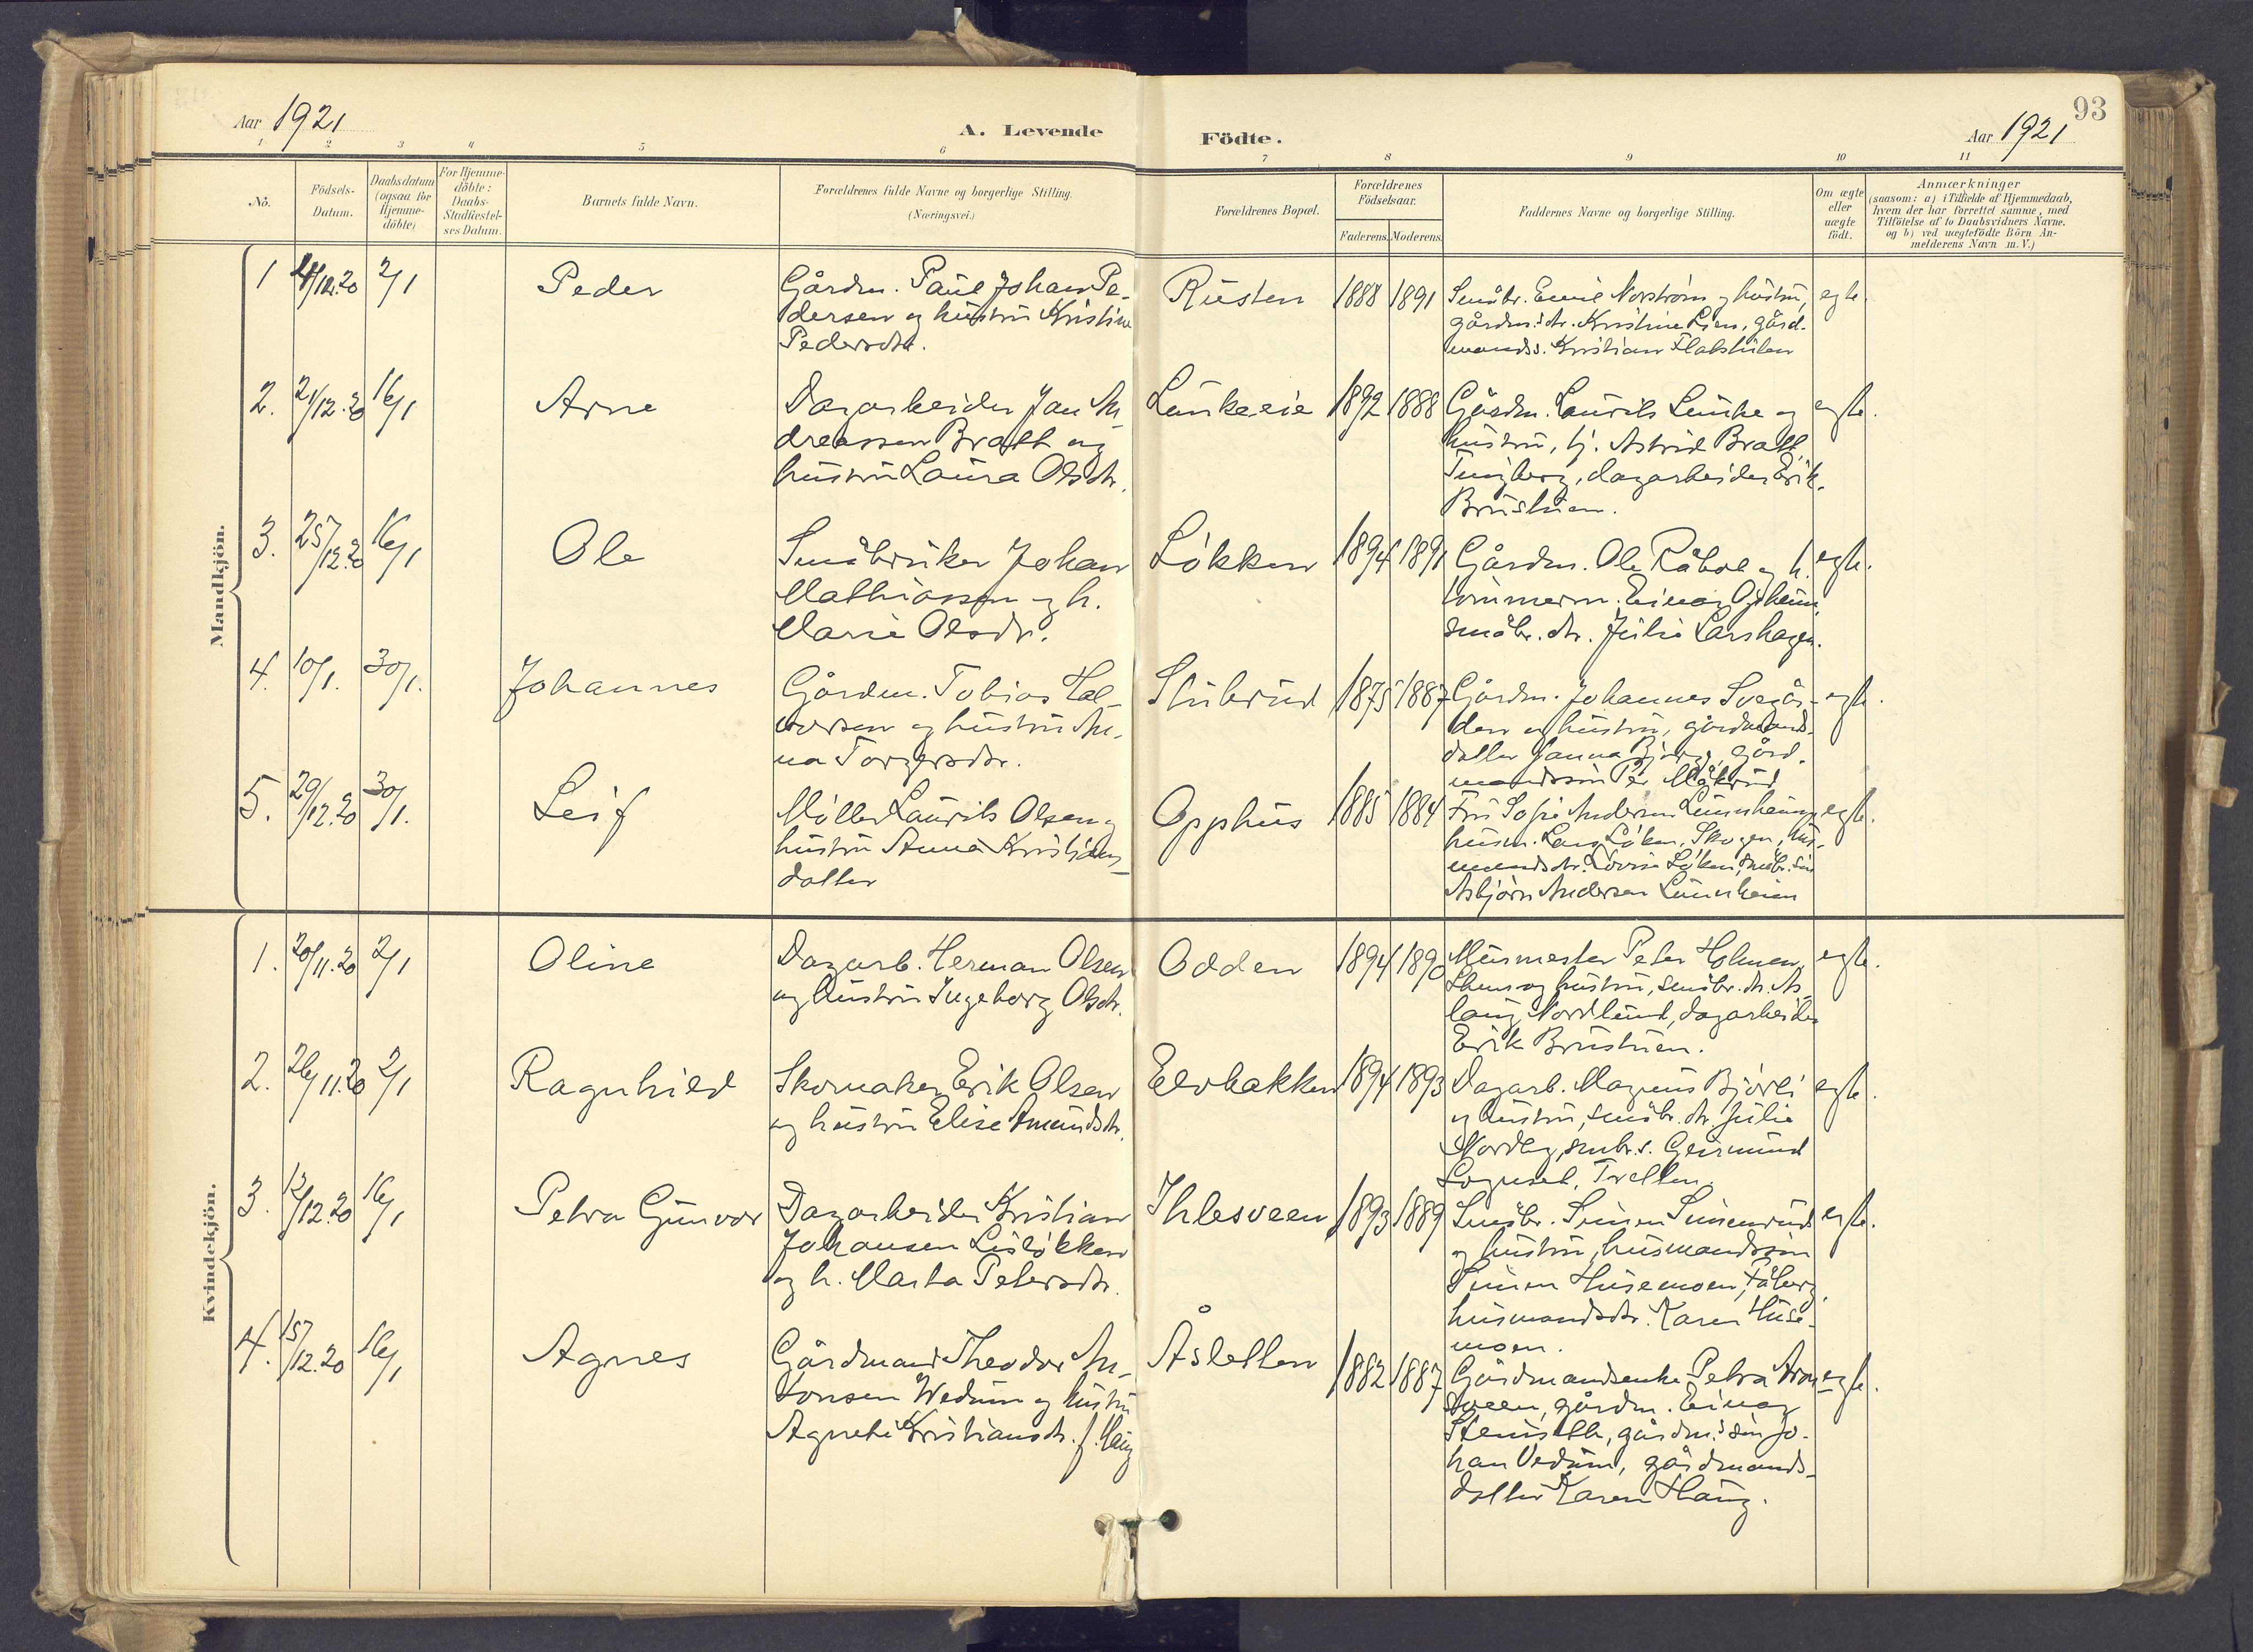 SAH, Øyer prestekontor, Ministerialbok nr. 12, 1897-1920, s. 93